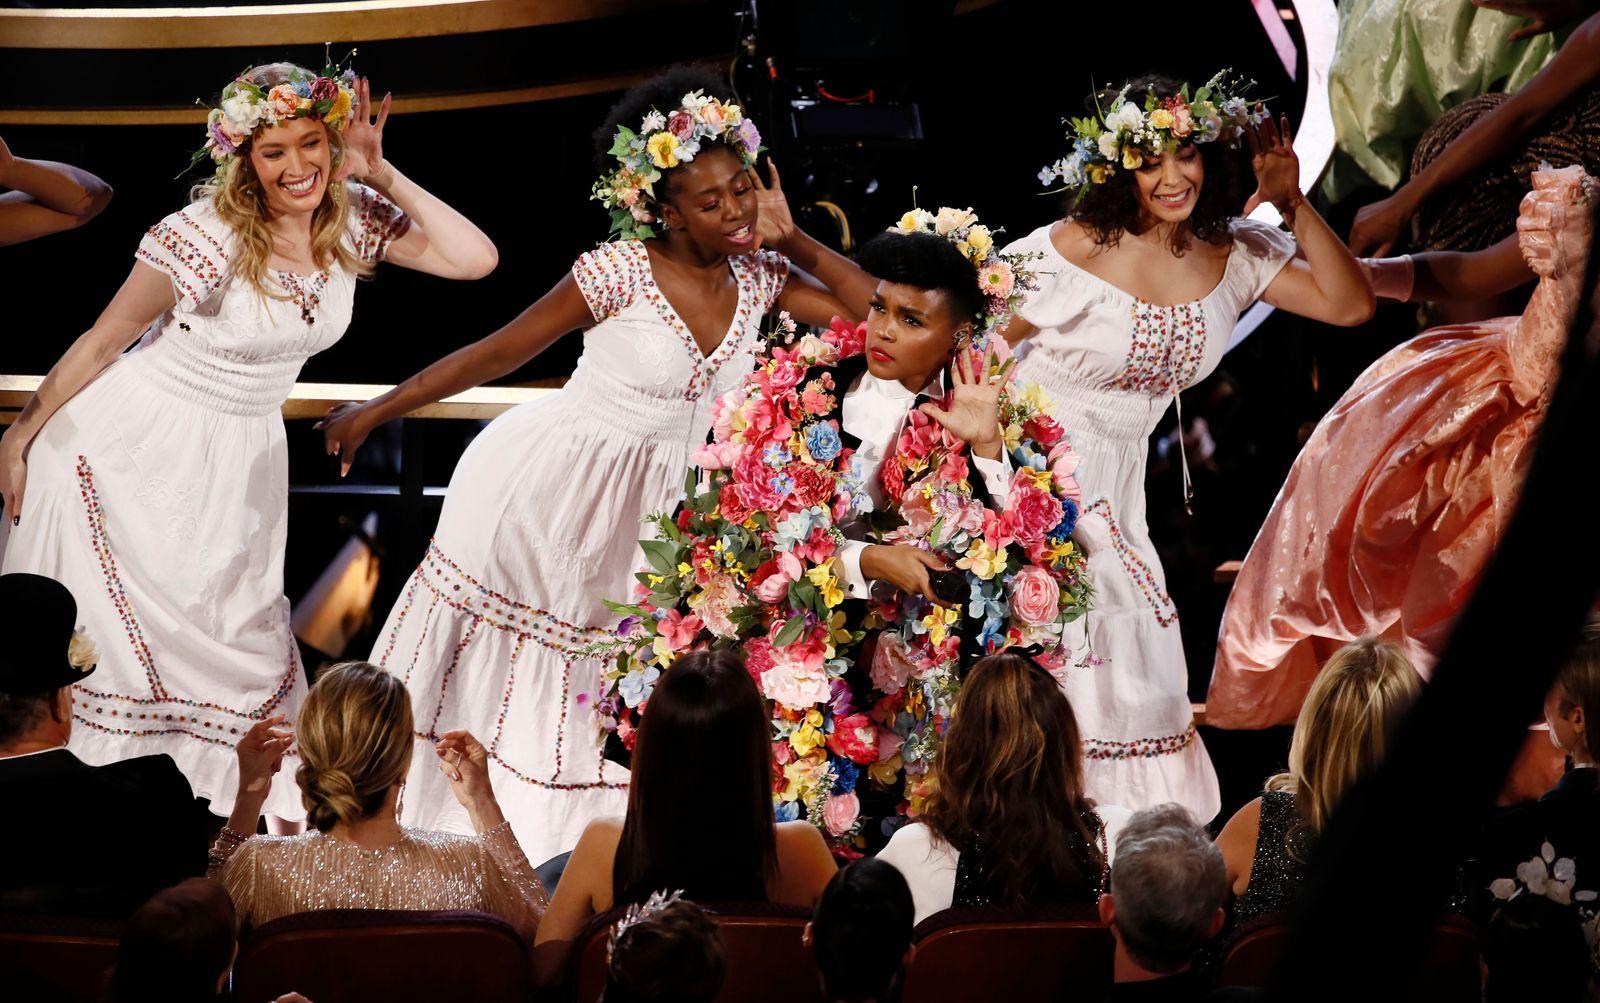 Ceremony - 92nd Academy Awards, Hollywood, USA - 09 Feb 2020